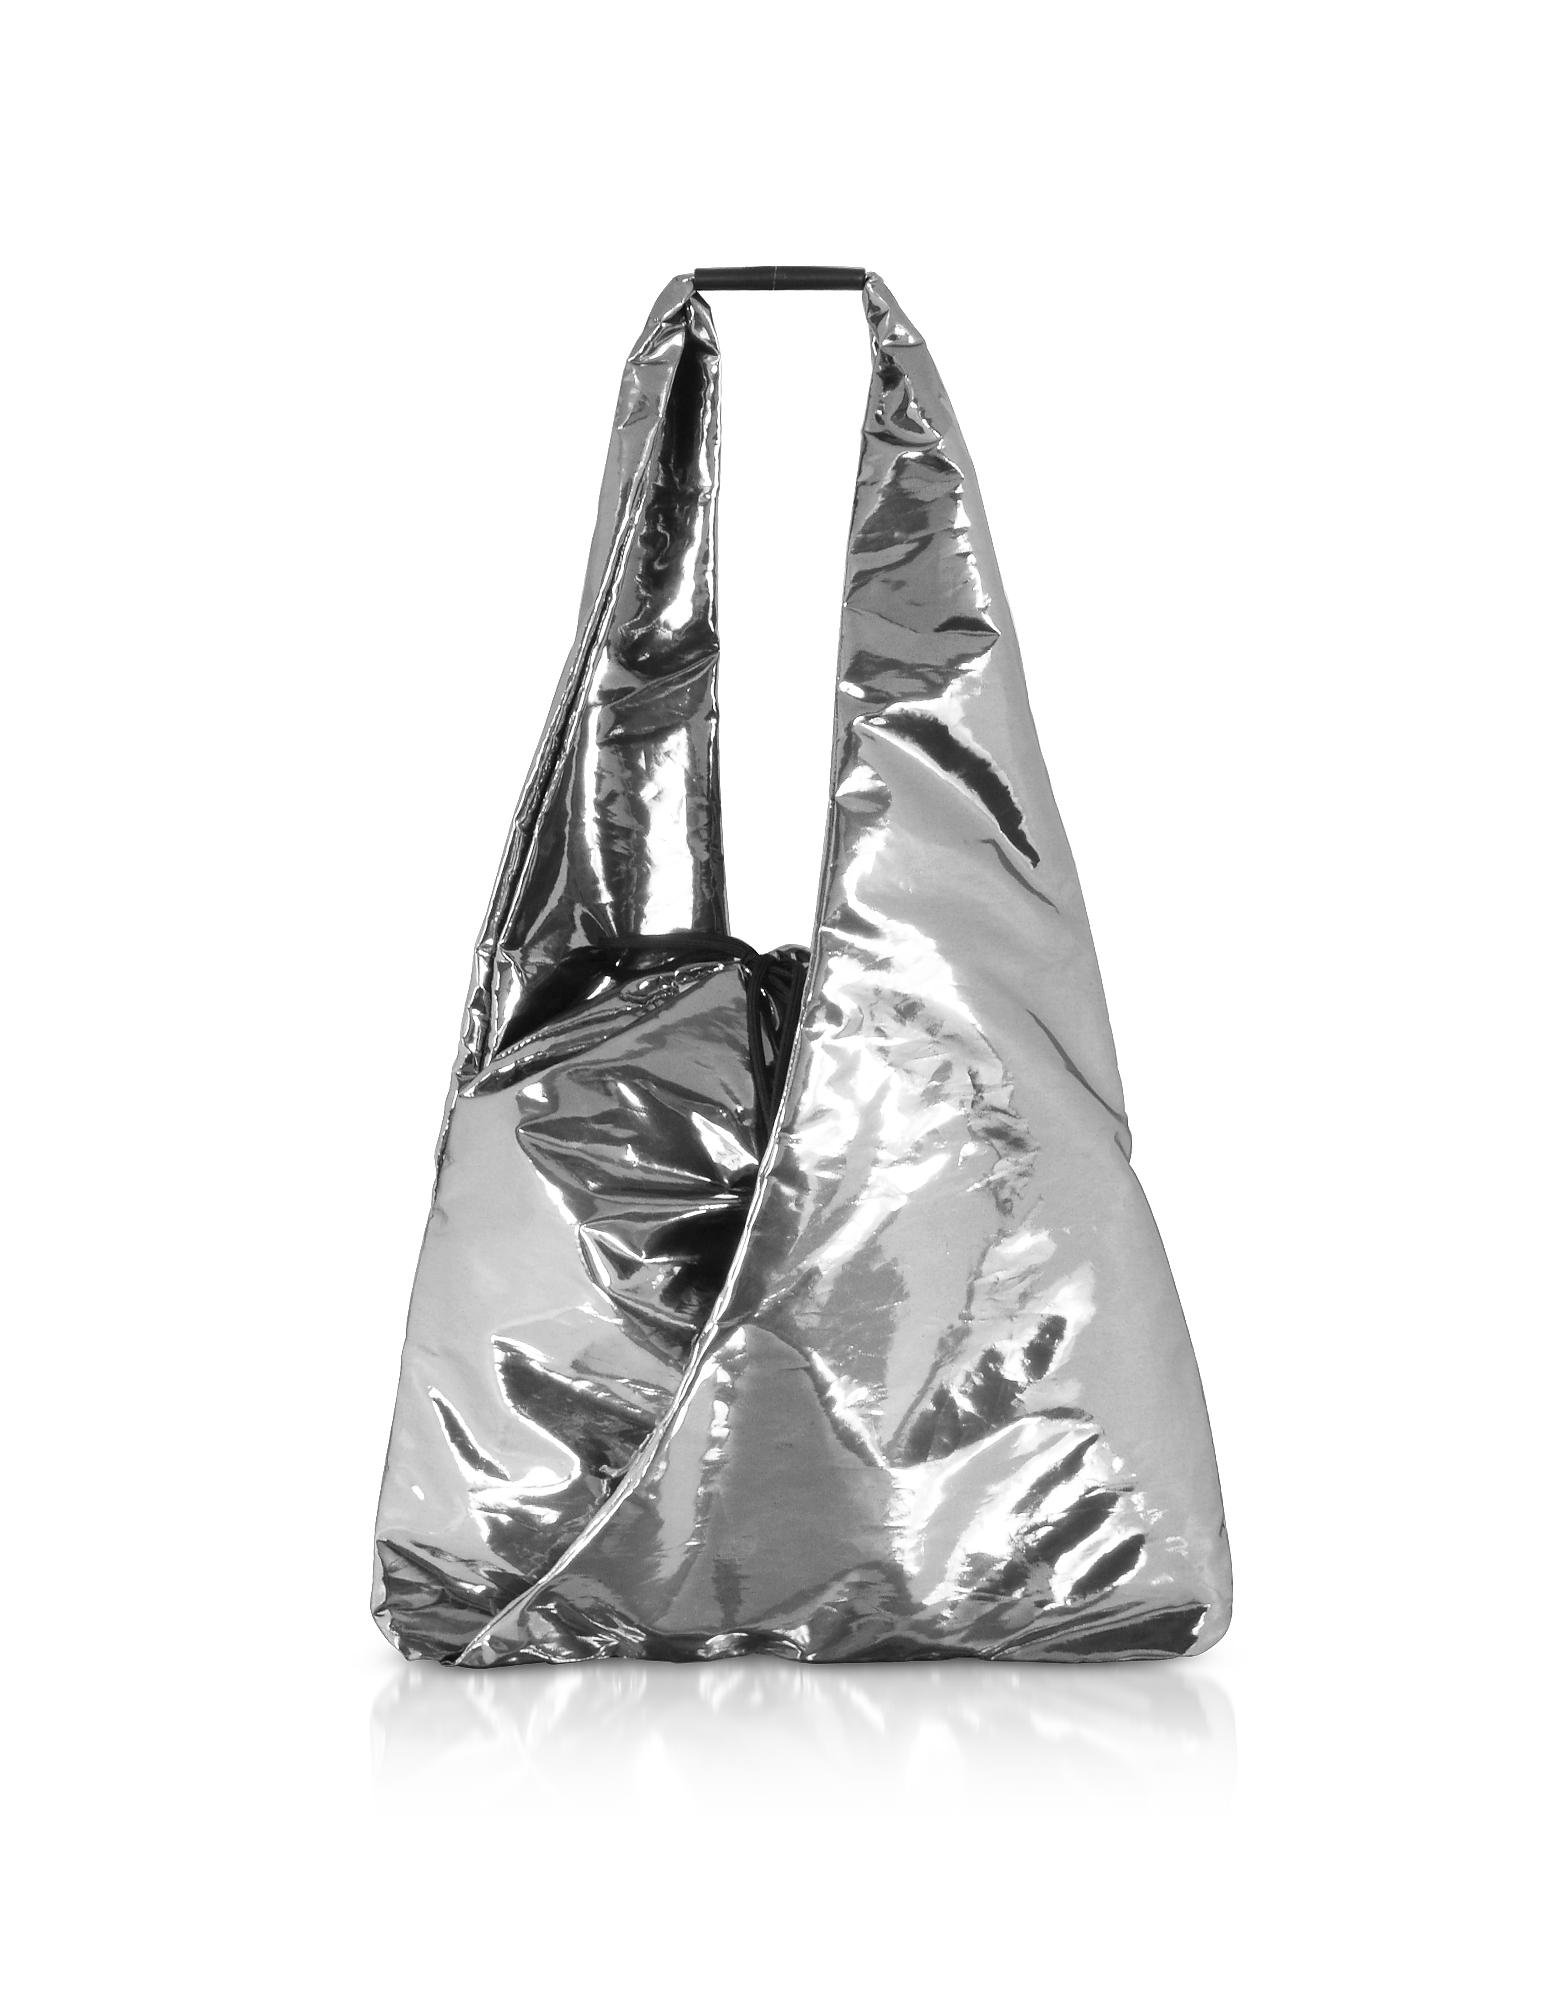 MM6 Maison Martin Margiela Designer Handbags, Metallic Japanese Bucket Bag